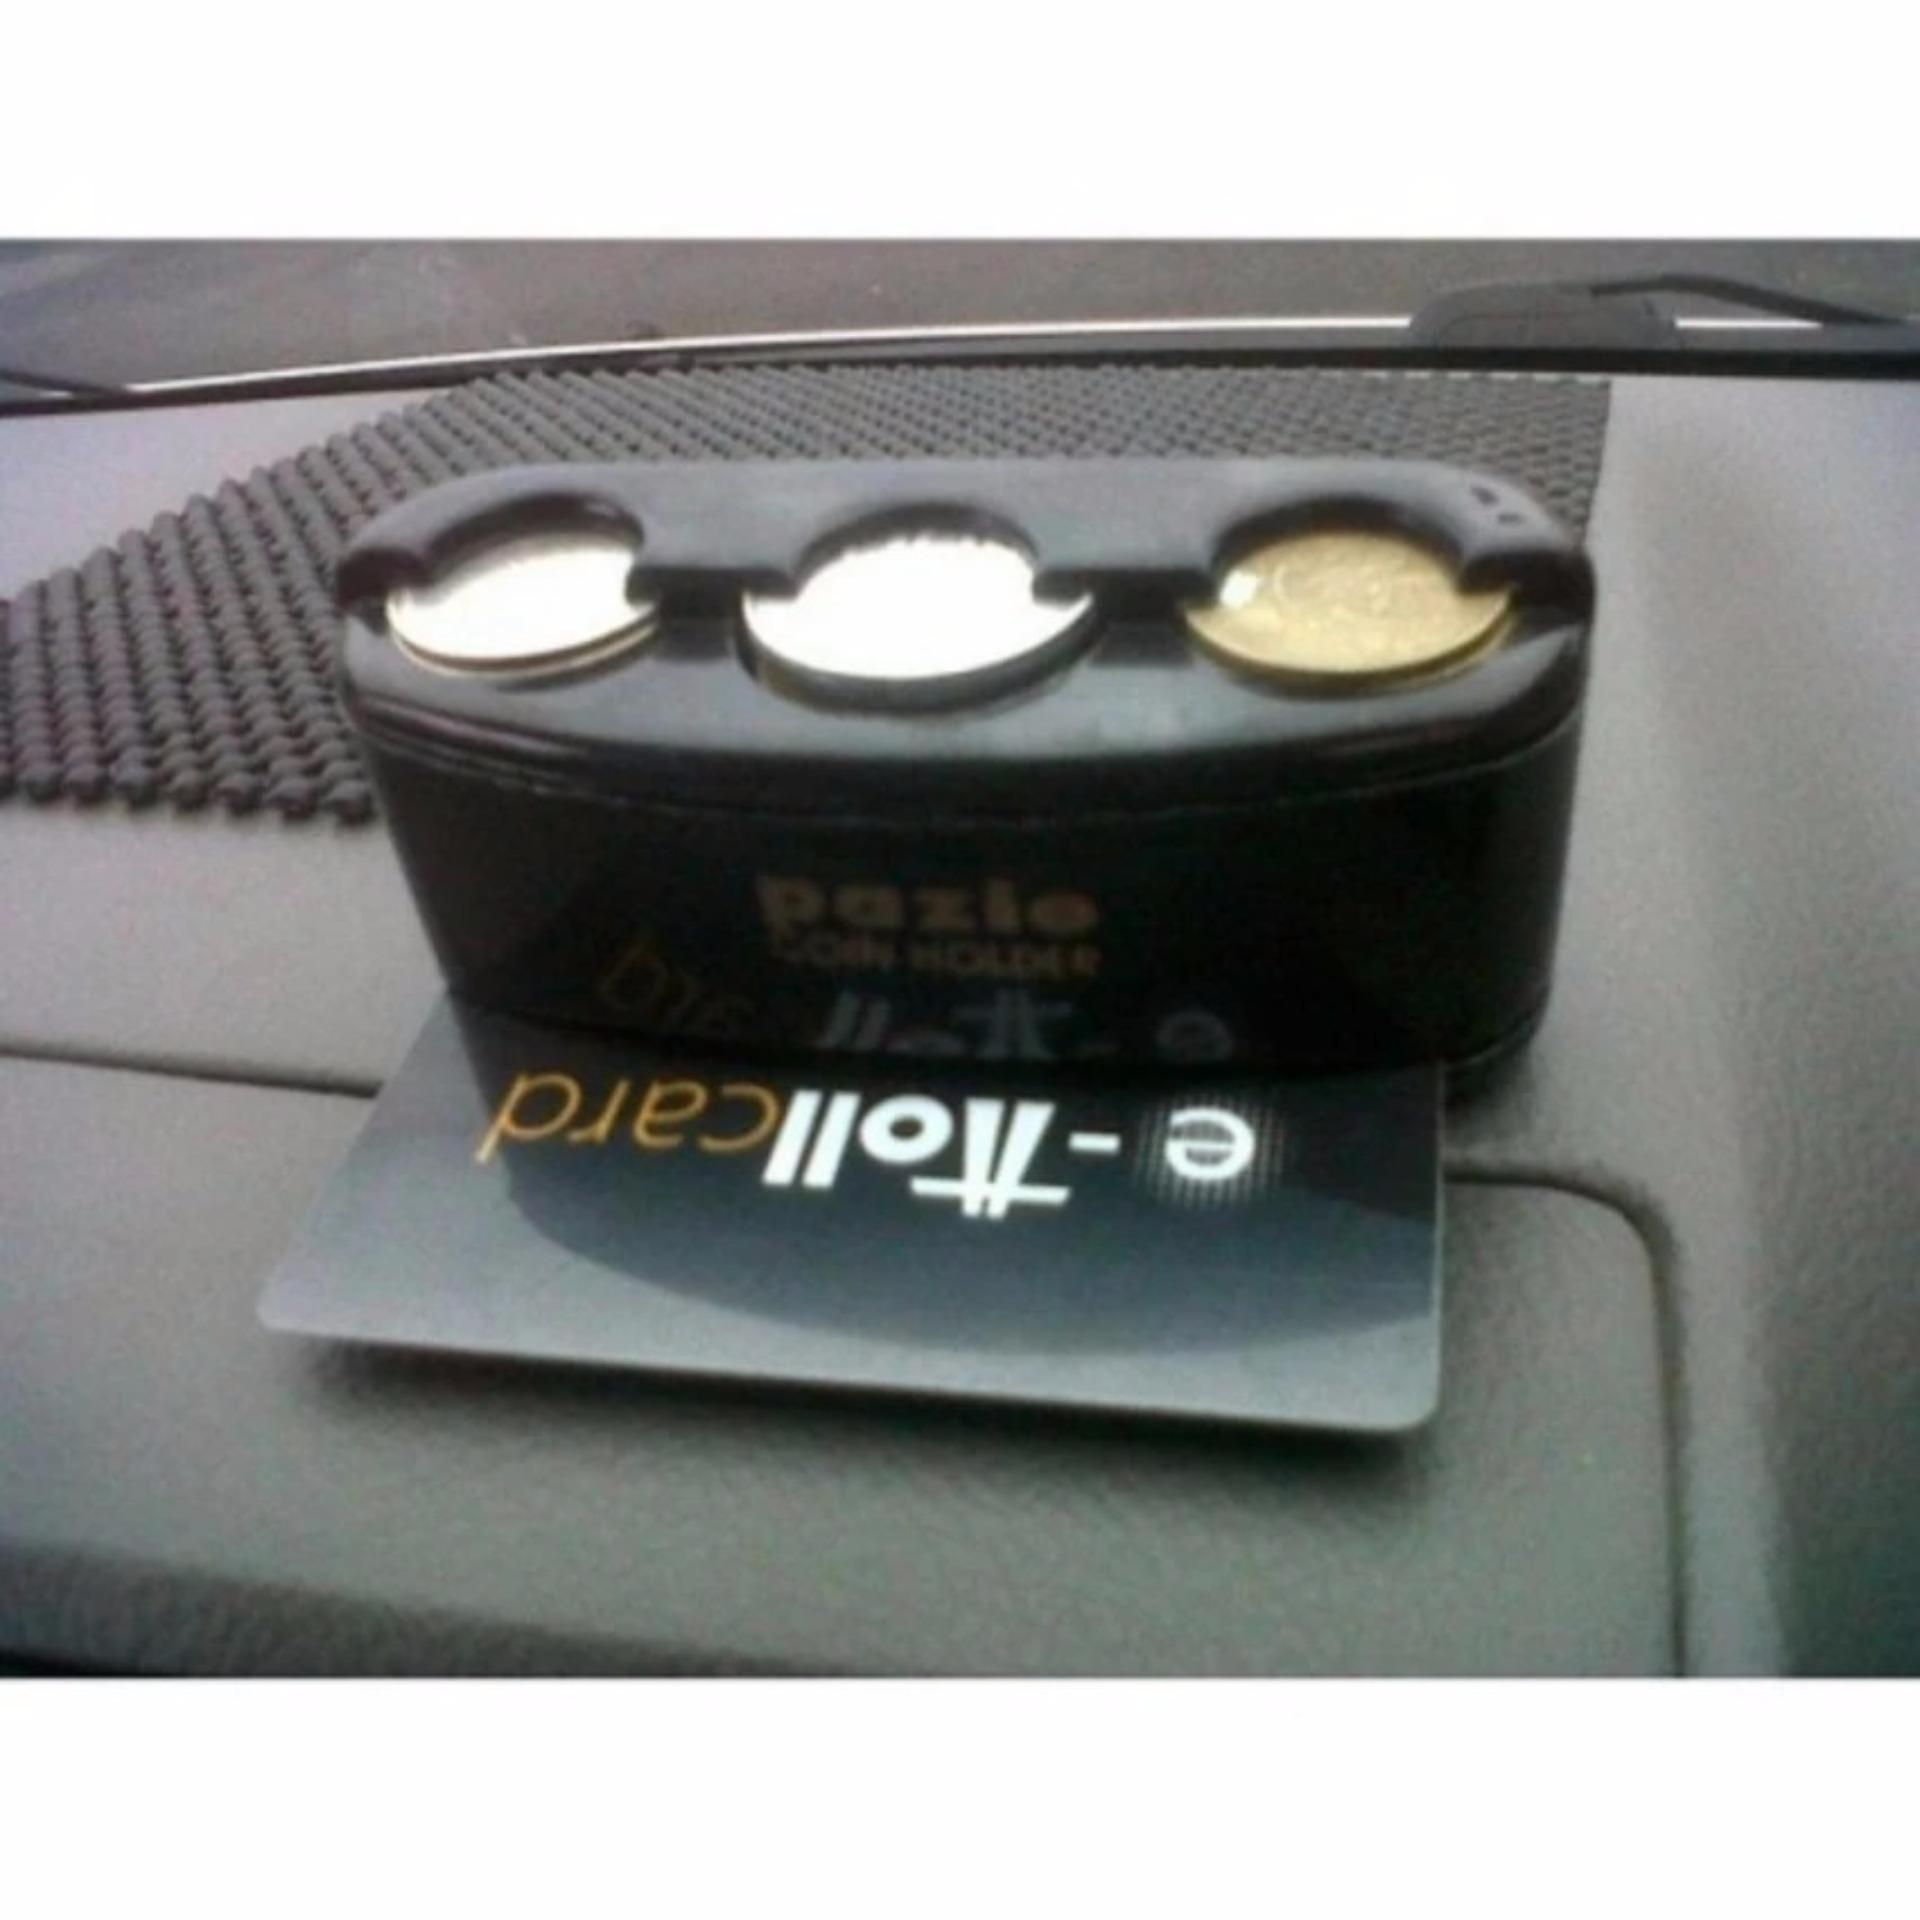 Tempat koin kartu mobil / coin card car holder - Tempat Uang Koin Coin Toll Card ...